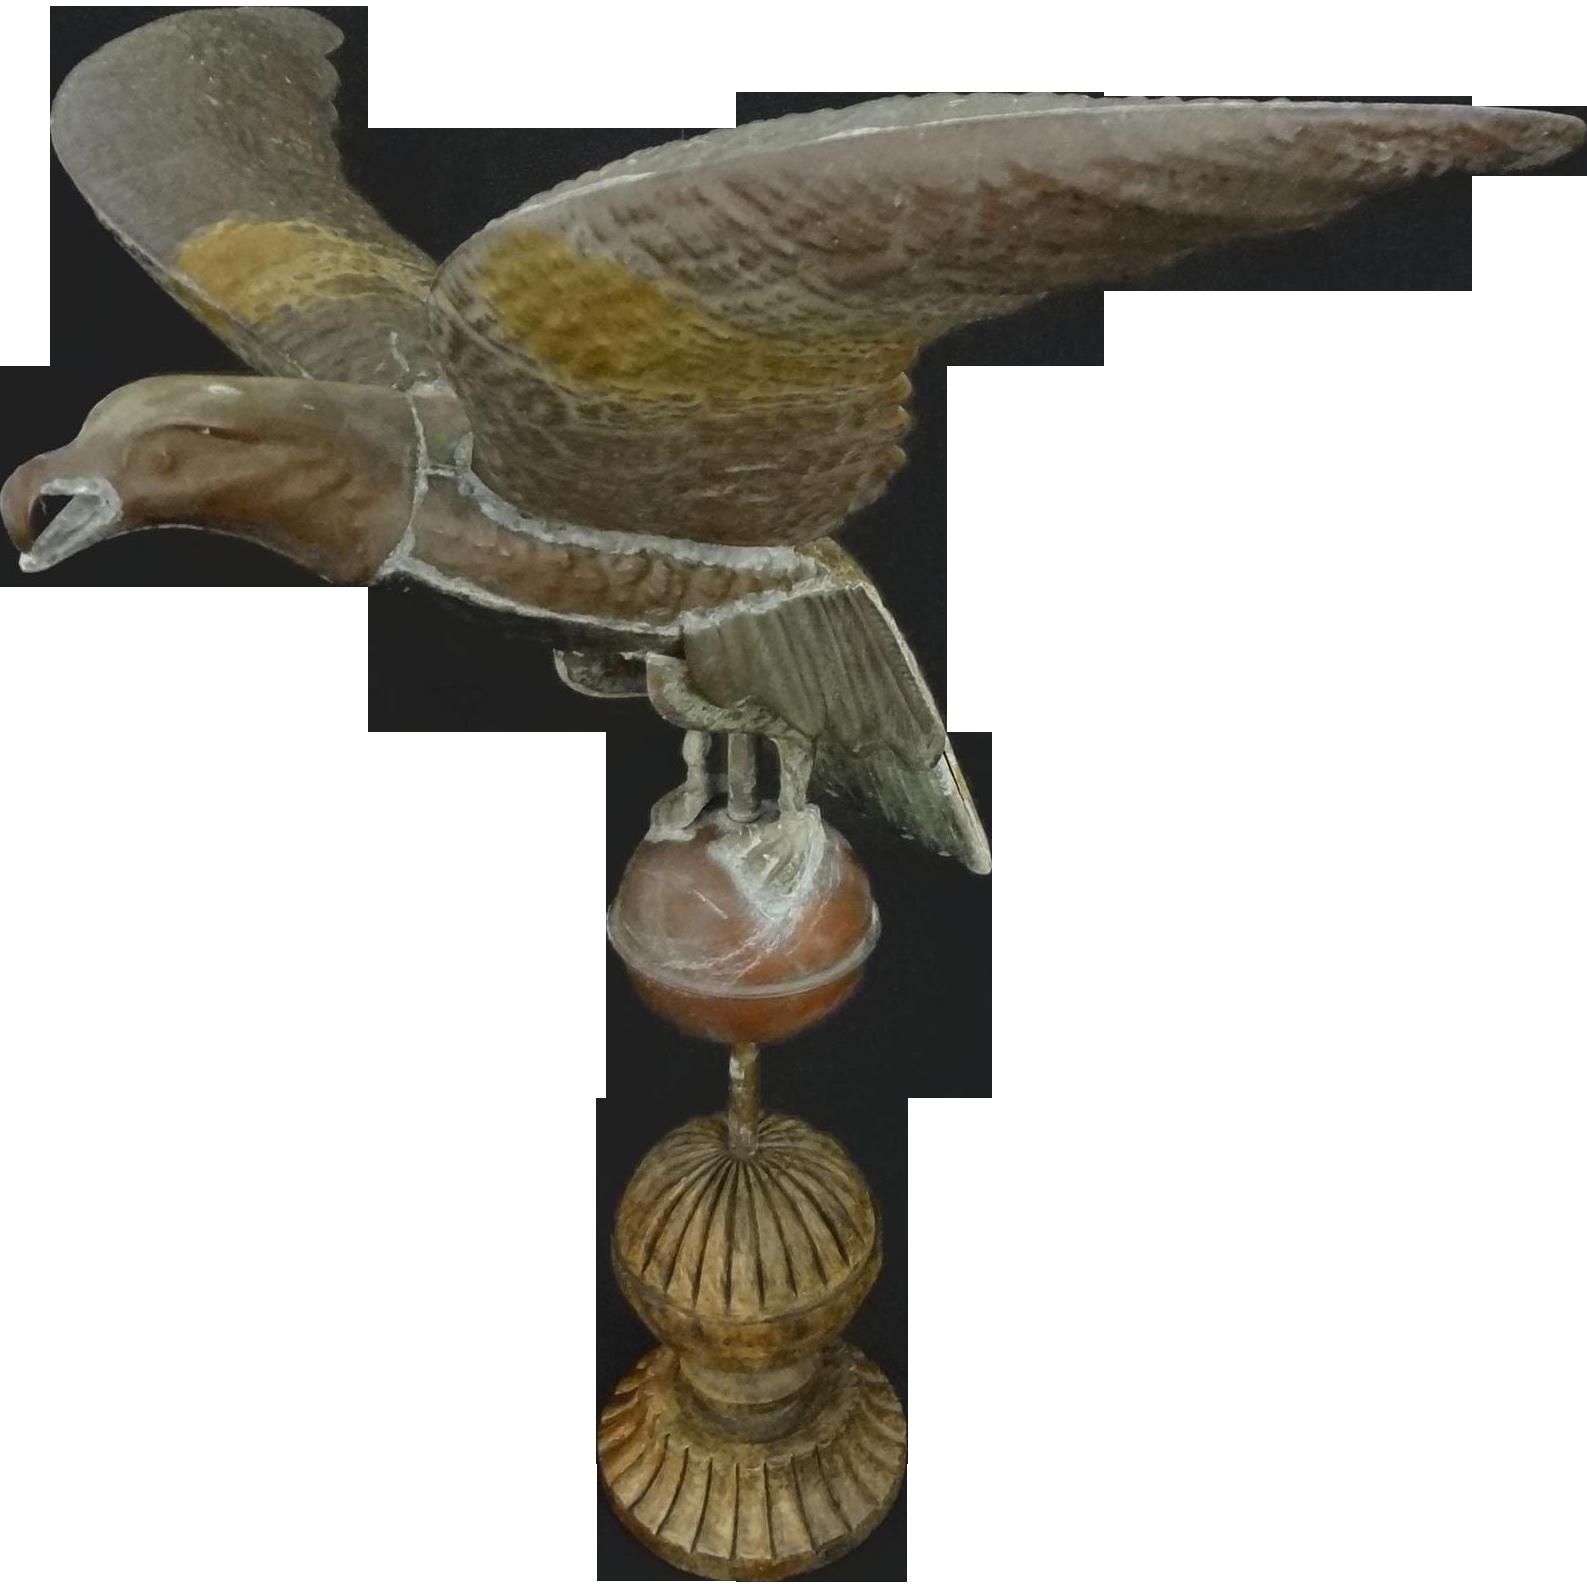 Molded Copper Spread Wings Eagle Weathervane on Ball Americana Folk Art